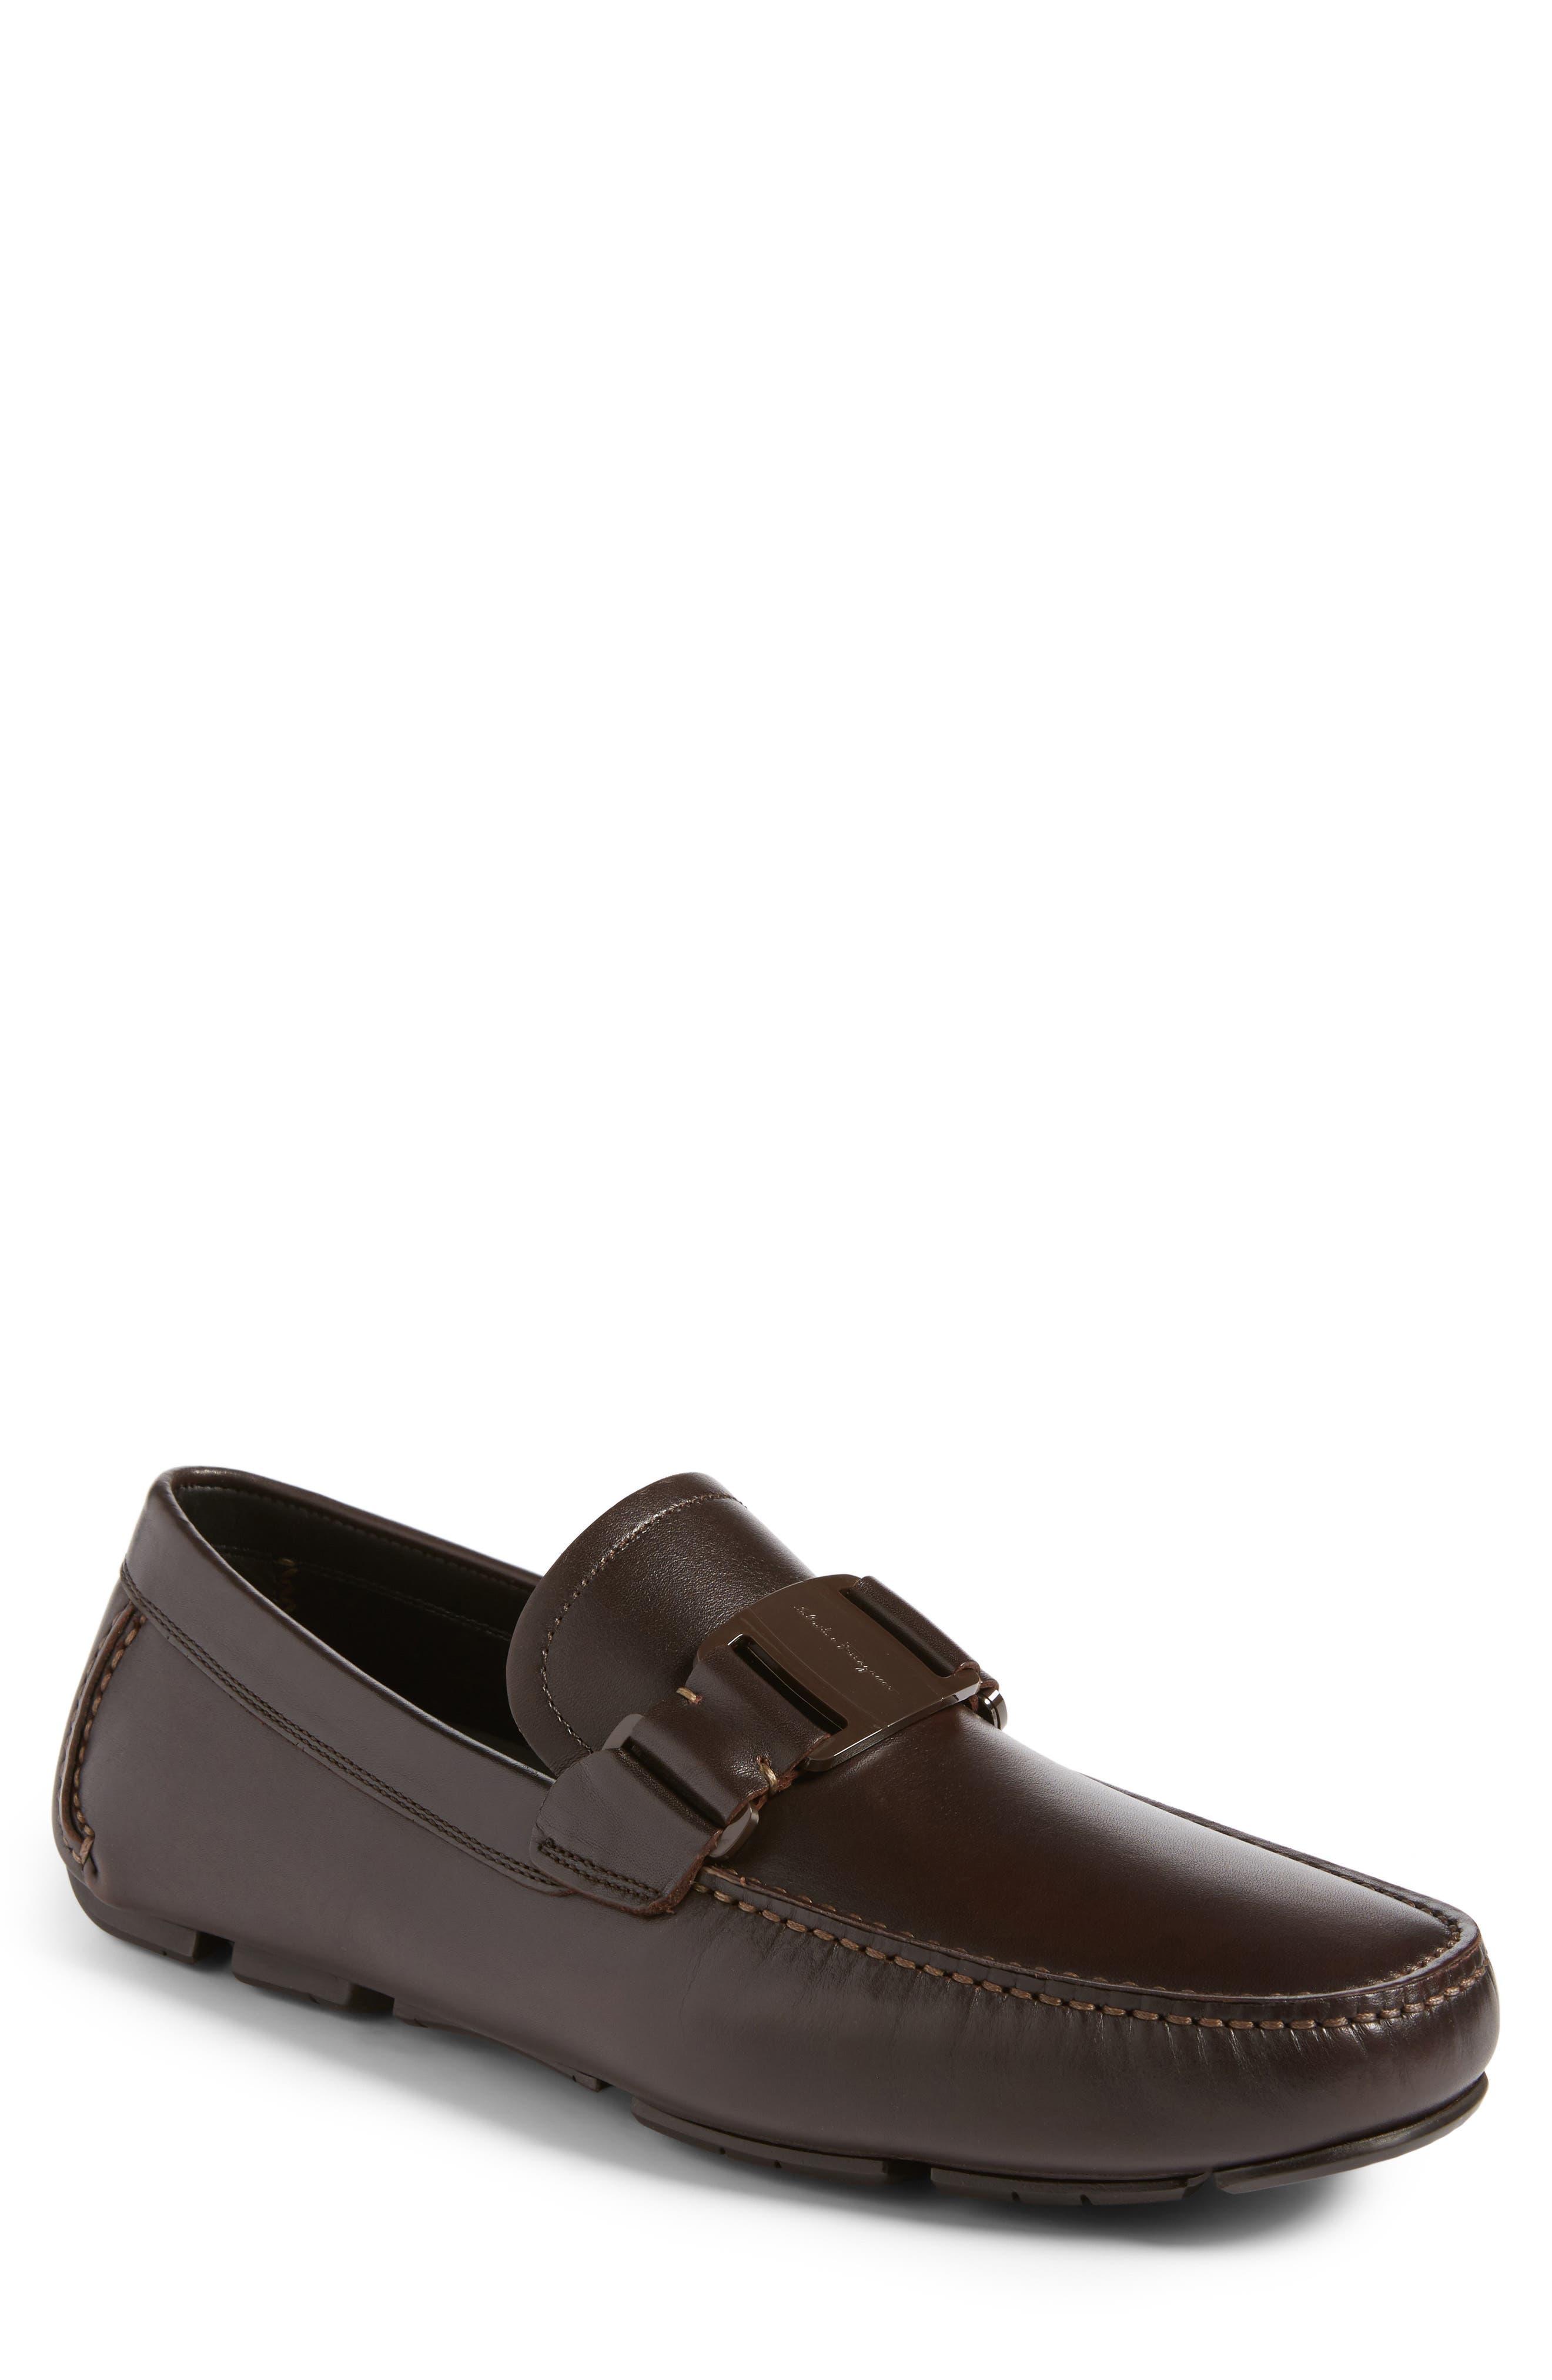 Salvatore Ferragamo Sardegna Driving Shoe (Men)